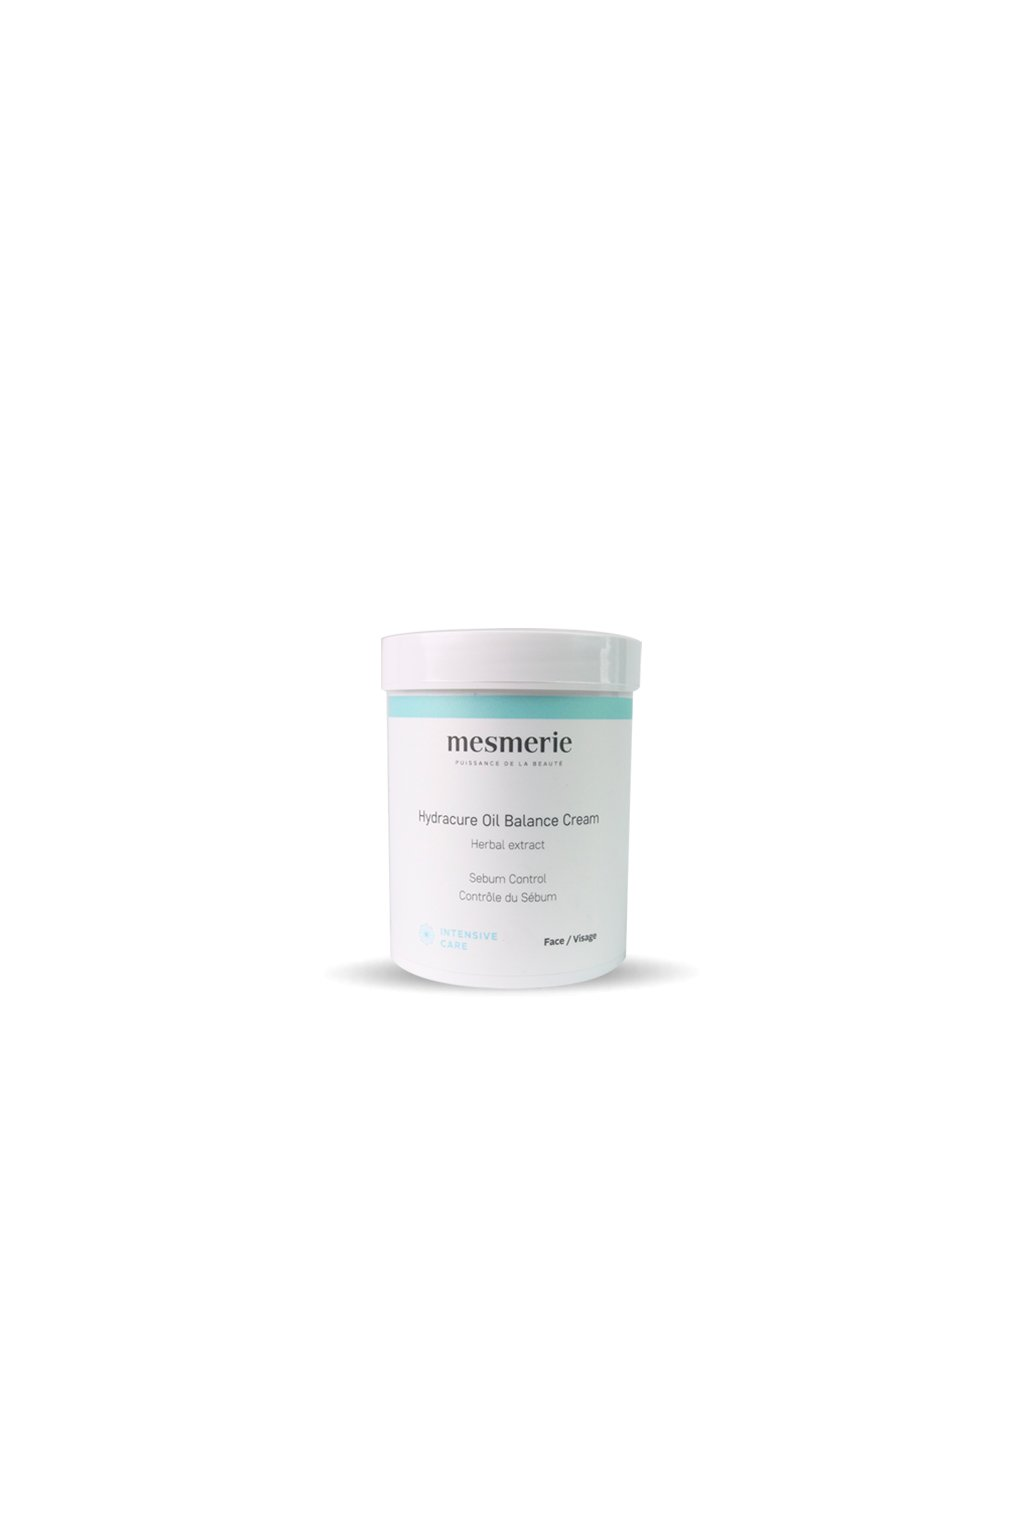 hydracure oil balance cream